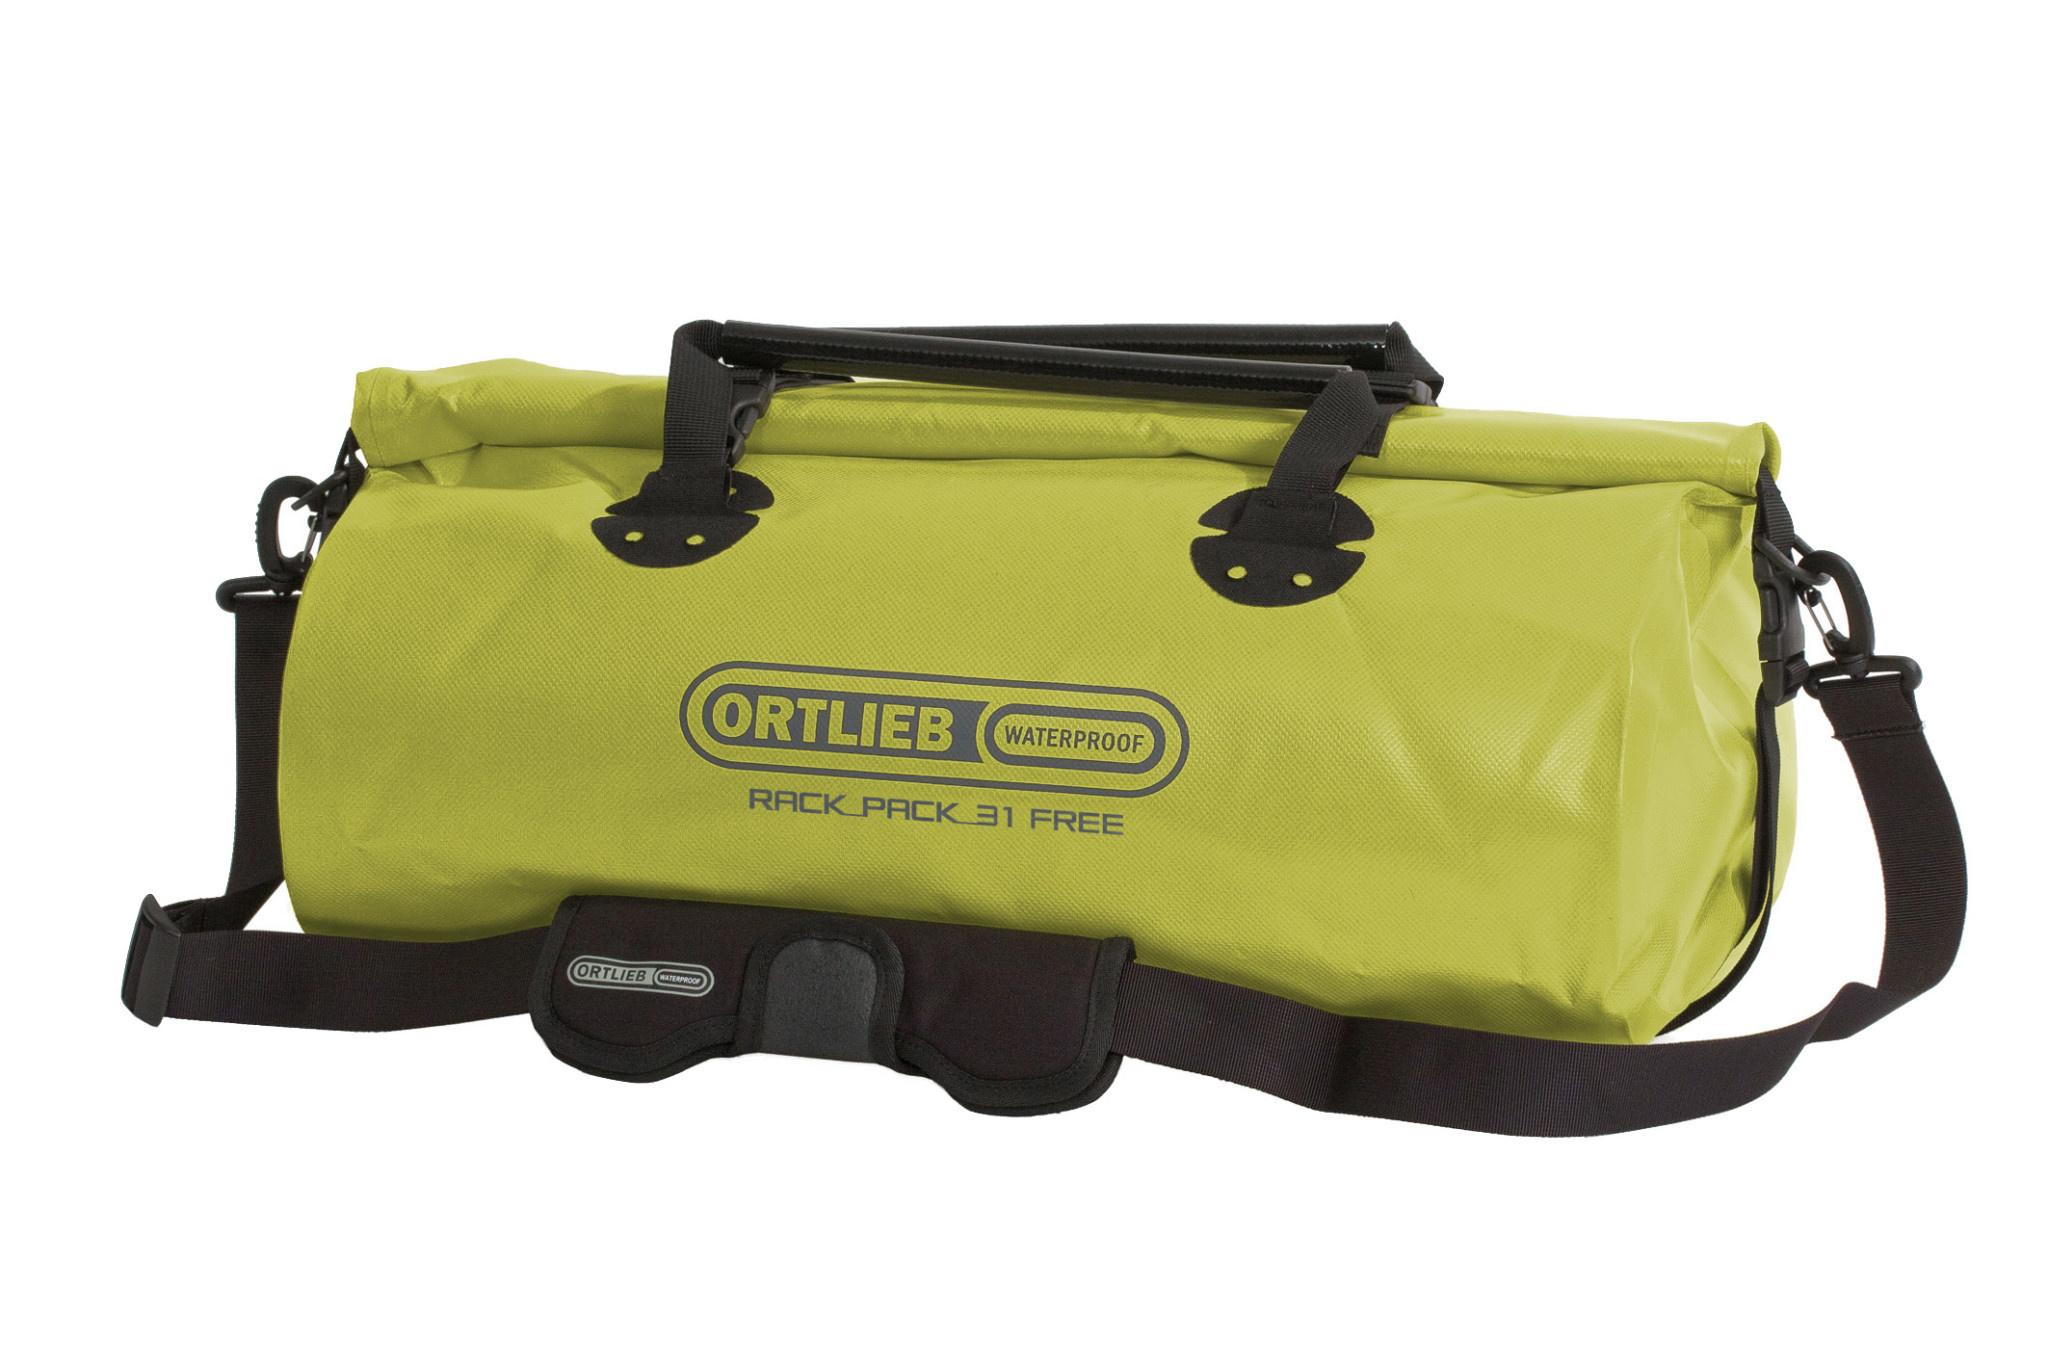 Ortlieb Ortlieb Rack-Pack Free